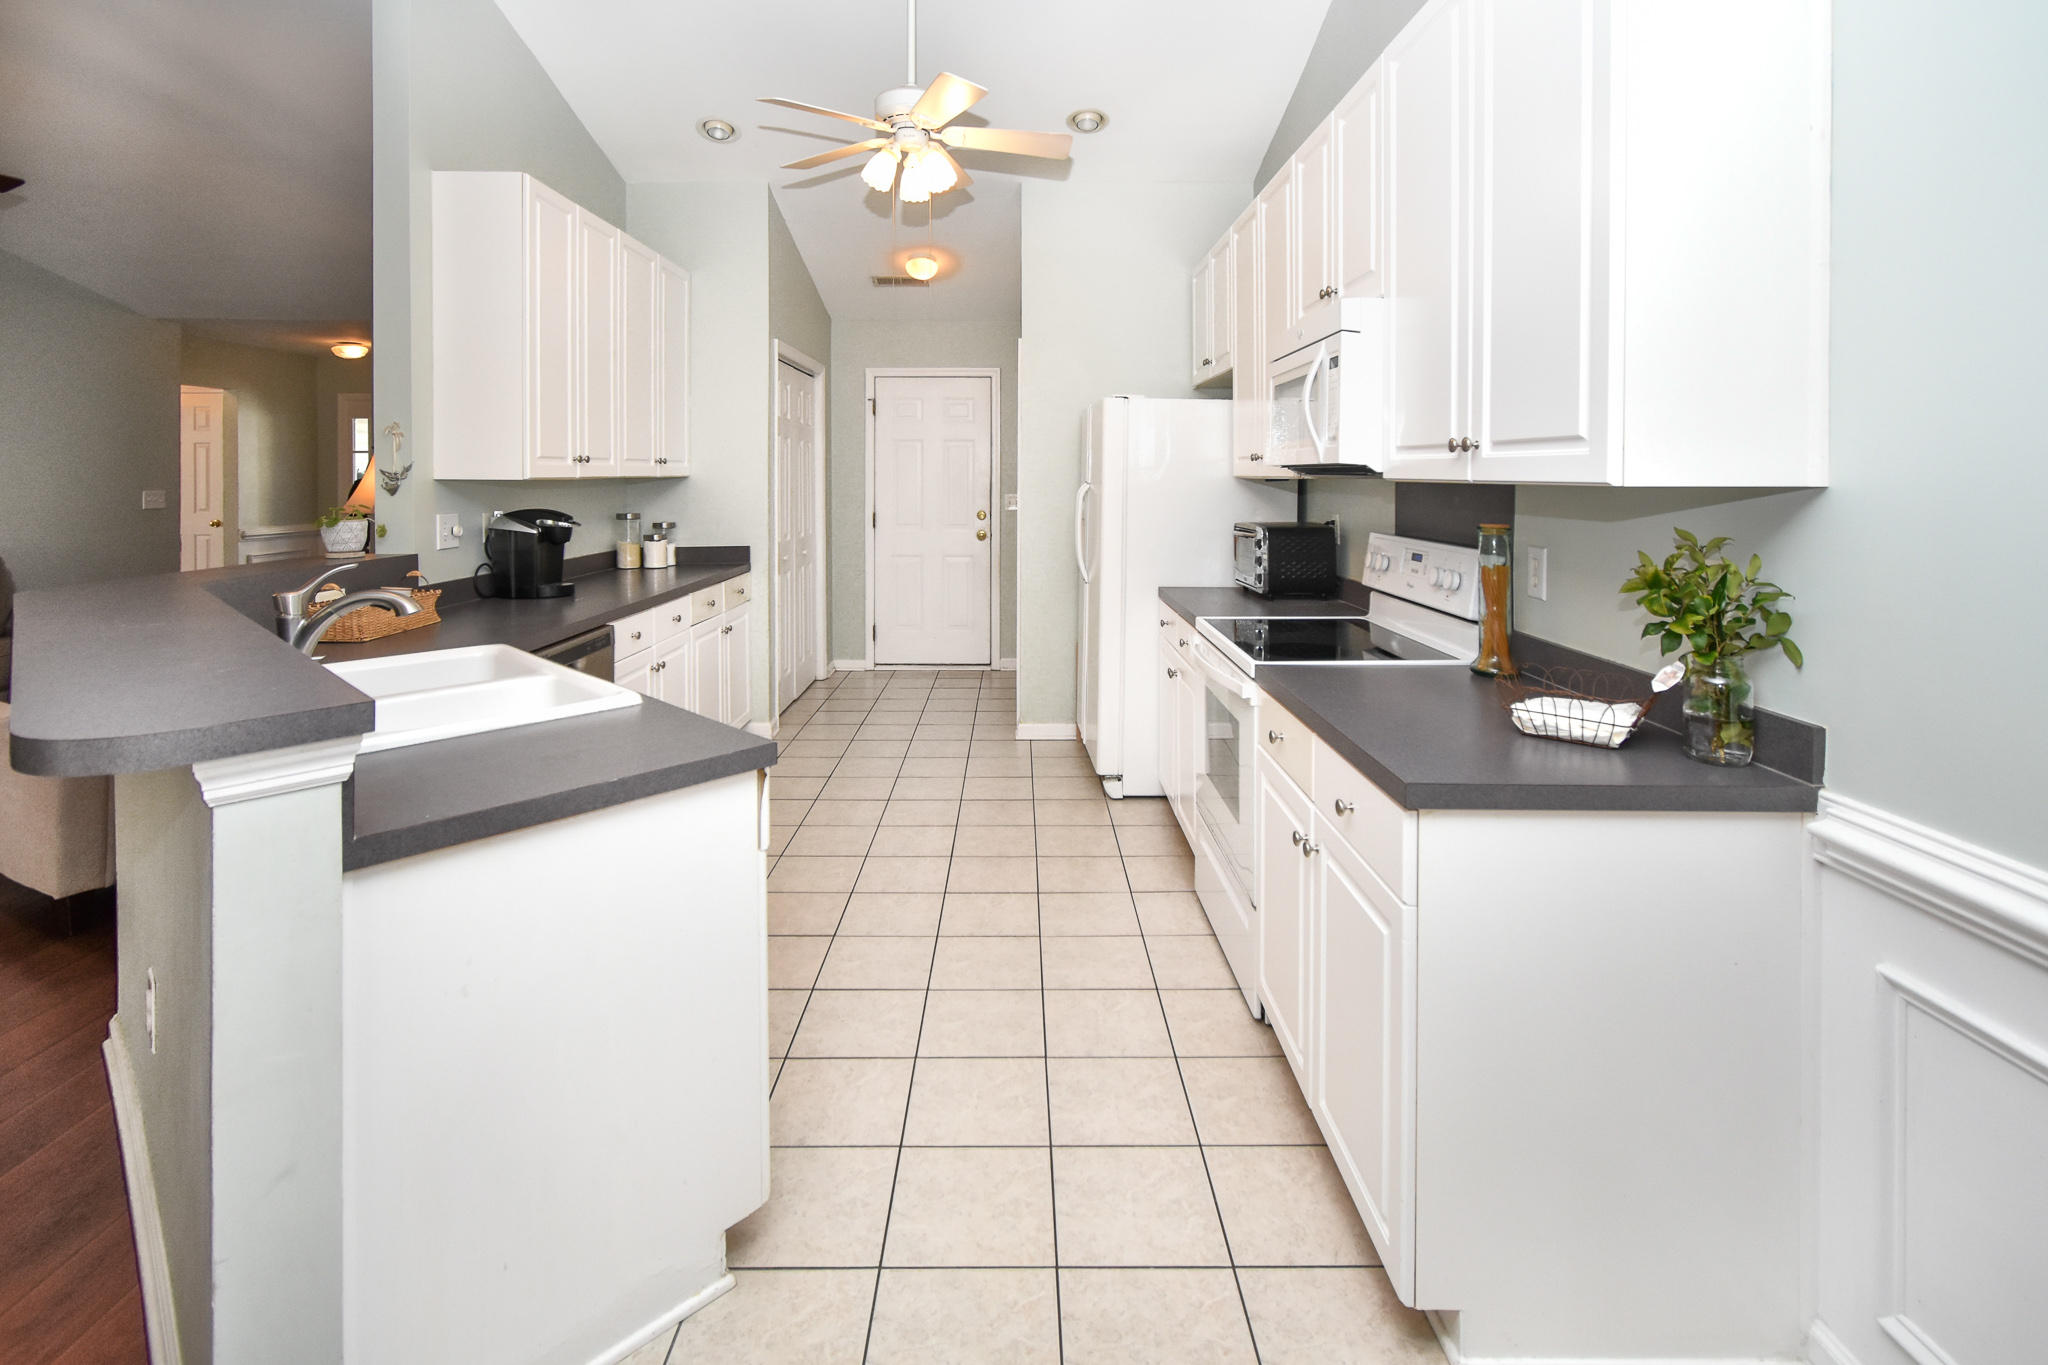 Park West Homes For Sale - 1444 Wellesley, Mount Pleasant, SC - 3